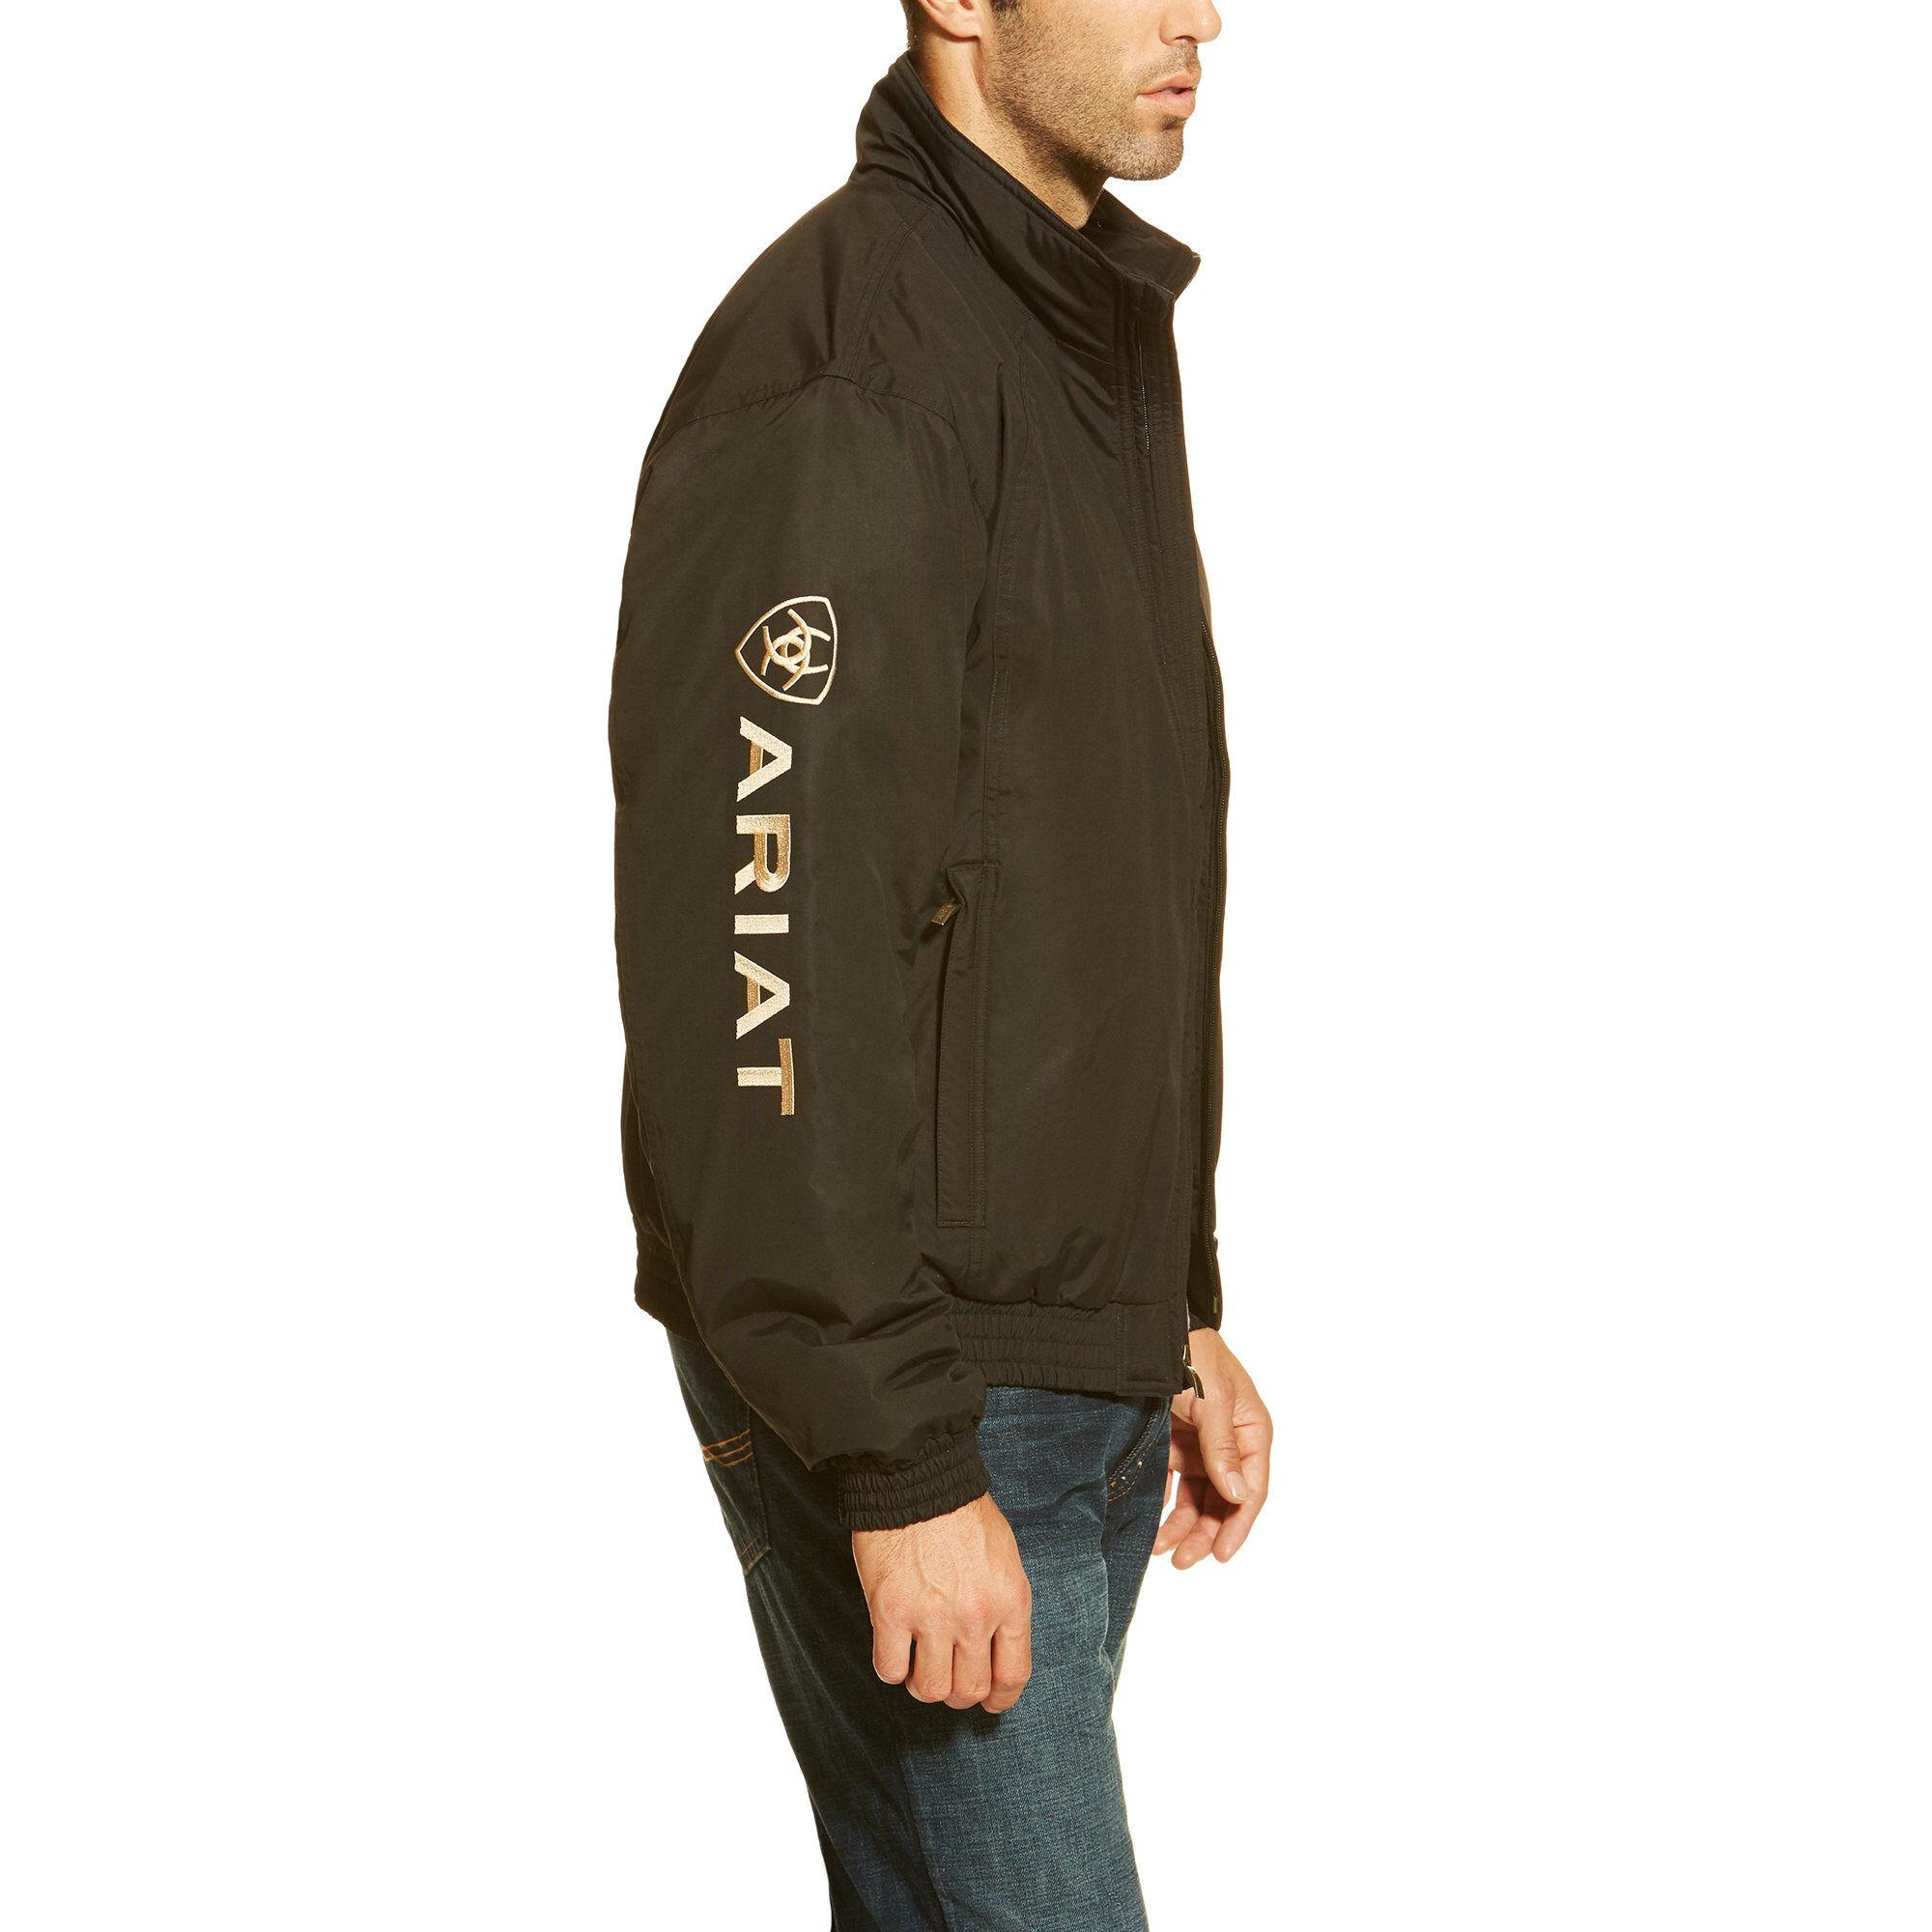 fba1d9a130 Images. Team Logo Jacket